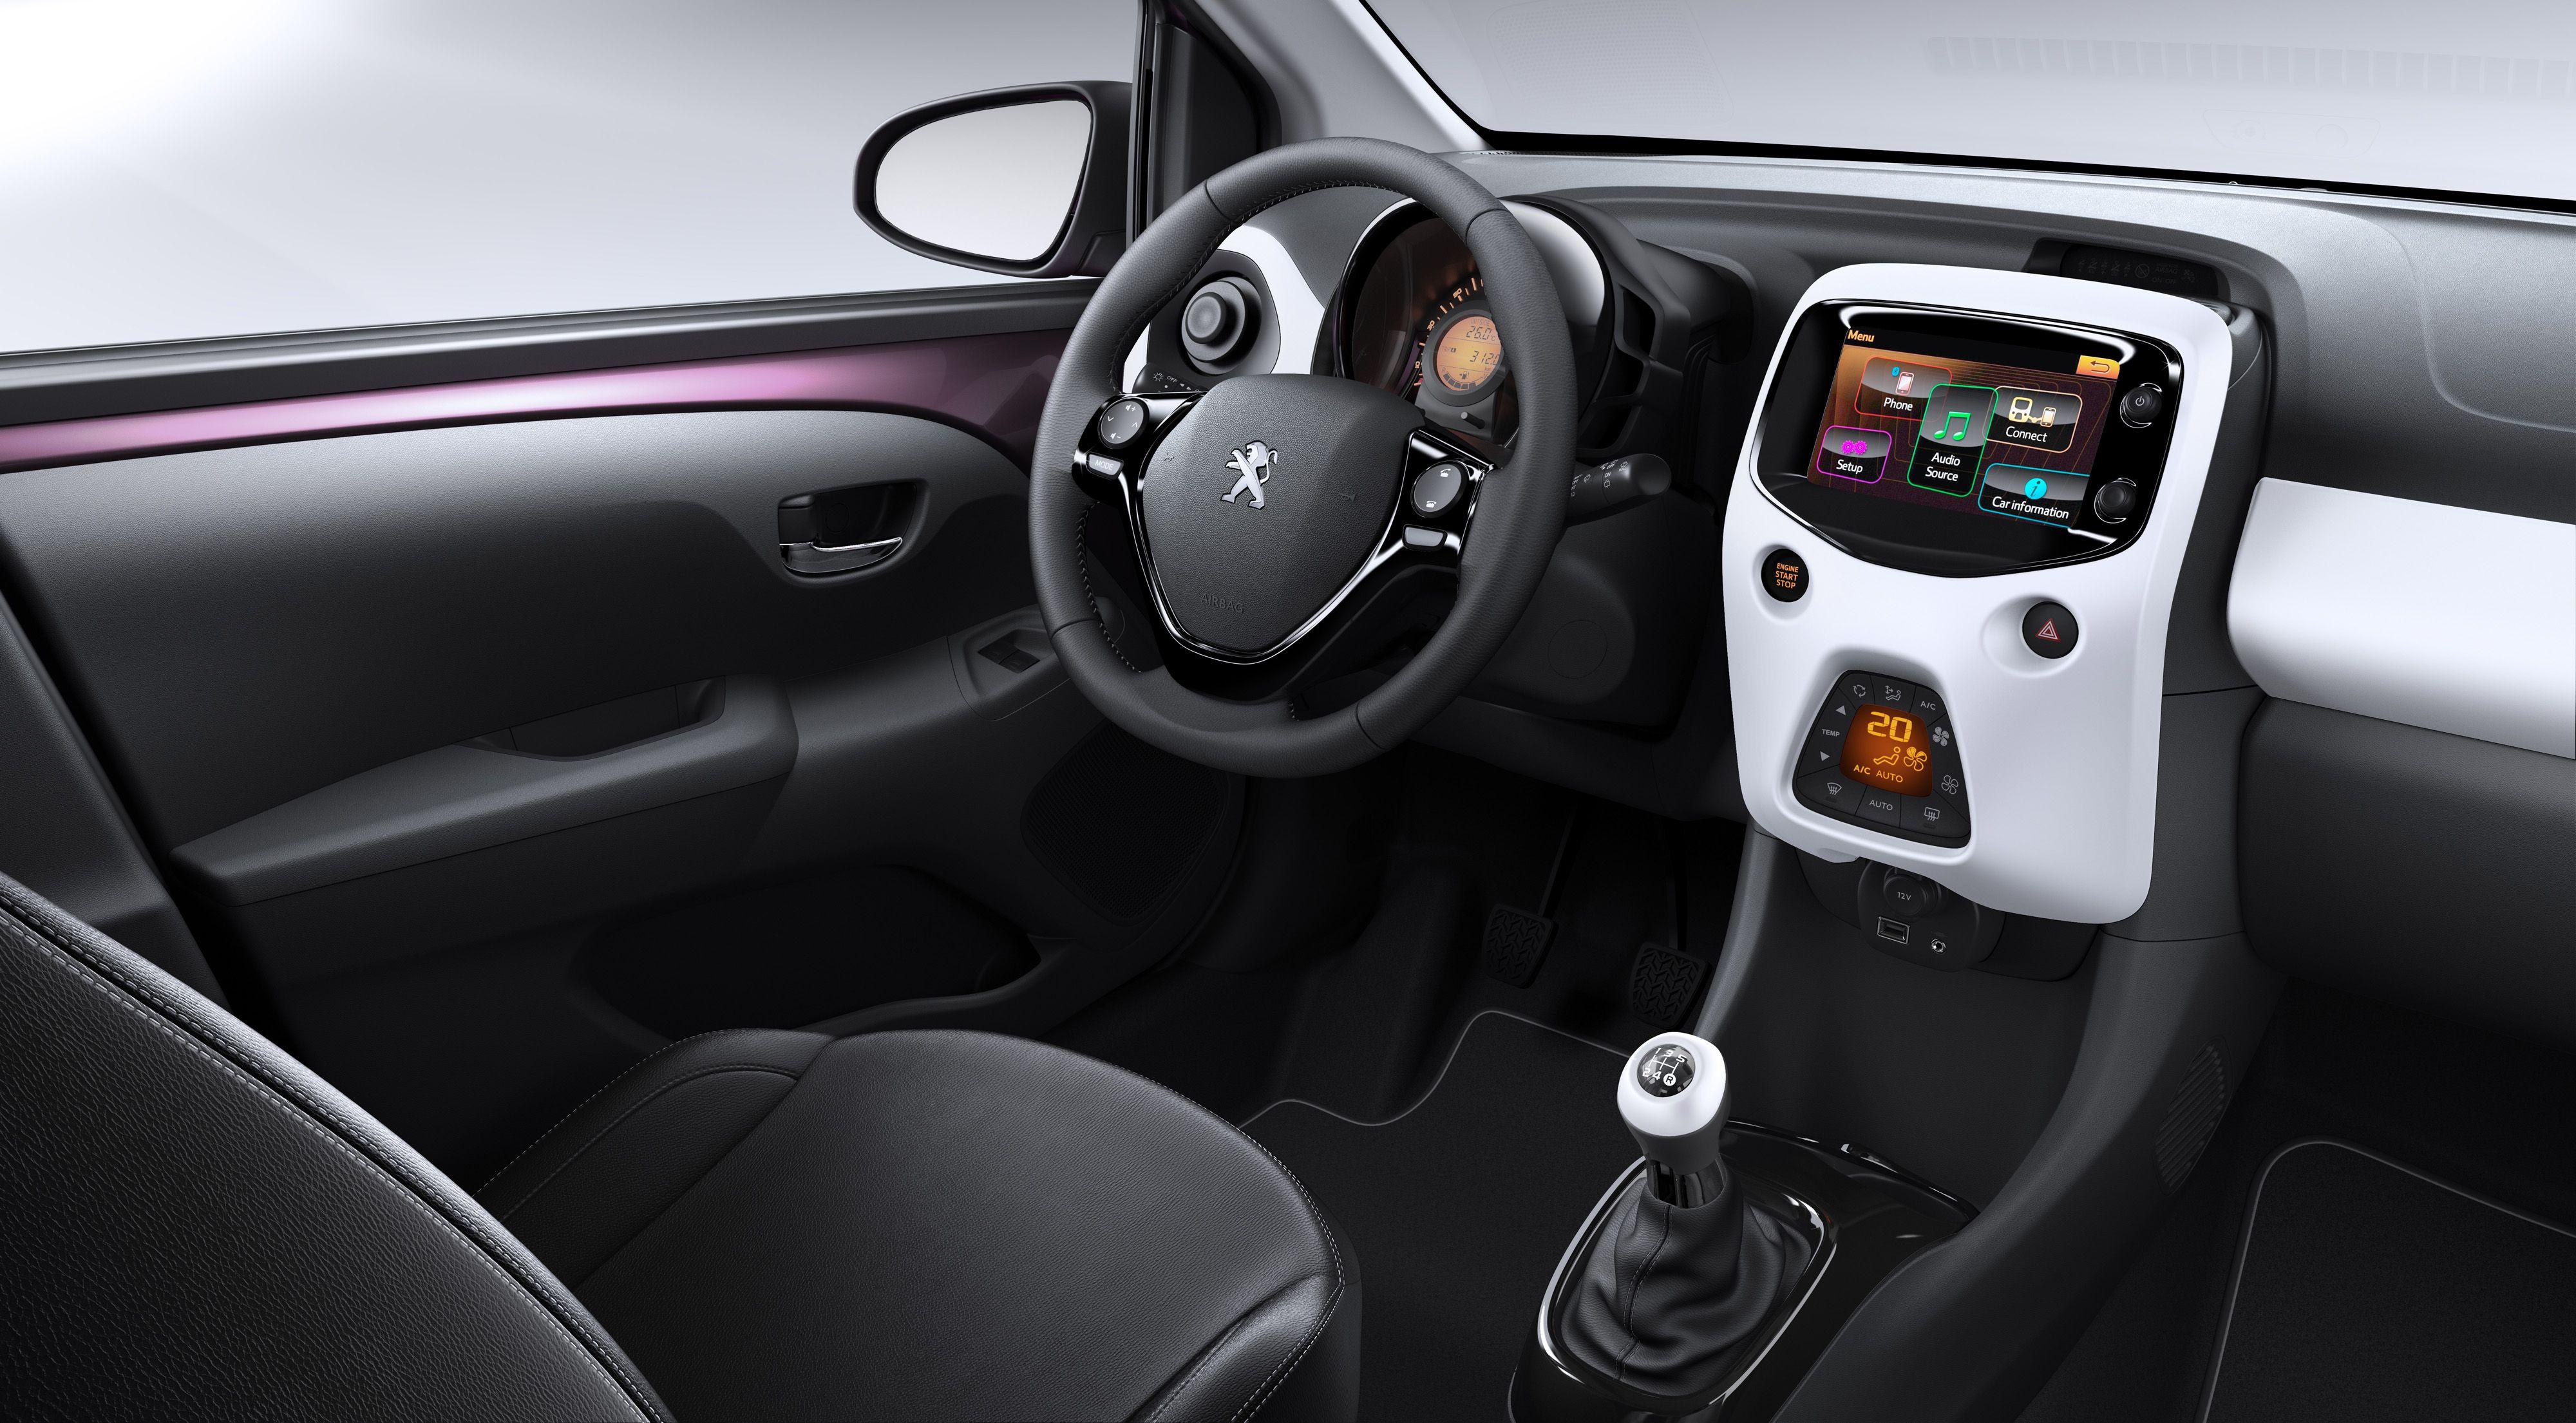 Interior Of Peugeot 108 Peugeot Psa Peugeot Citroen